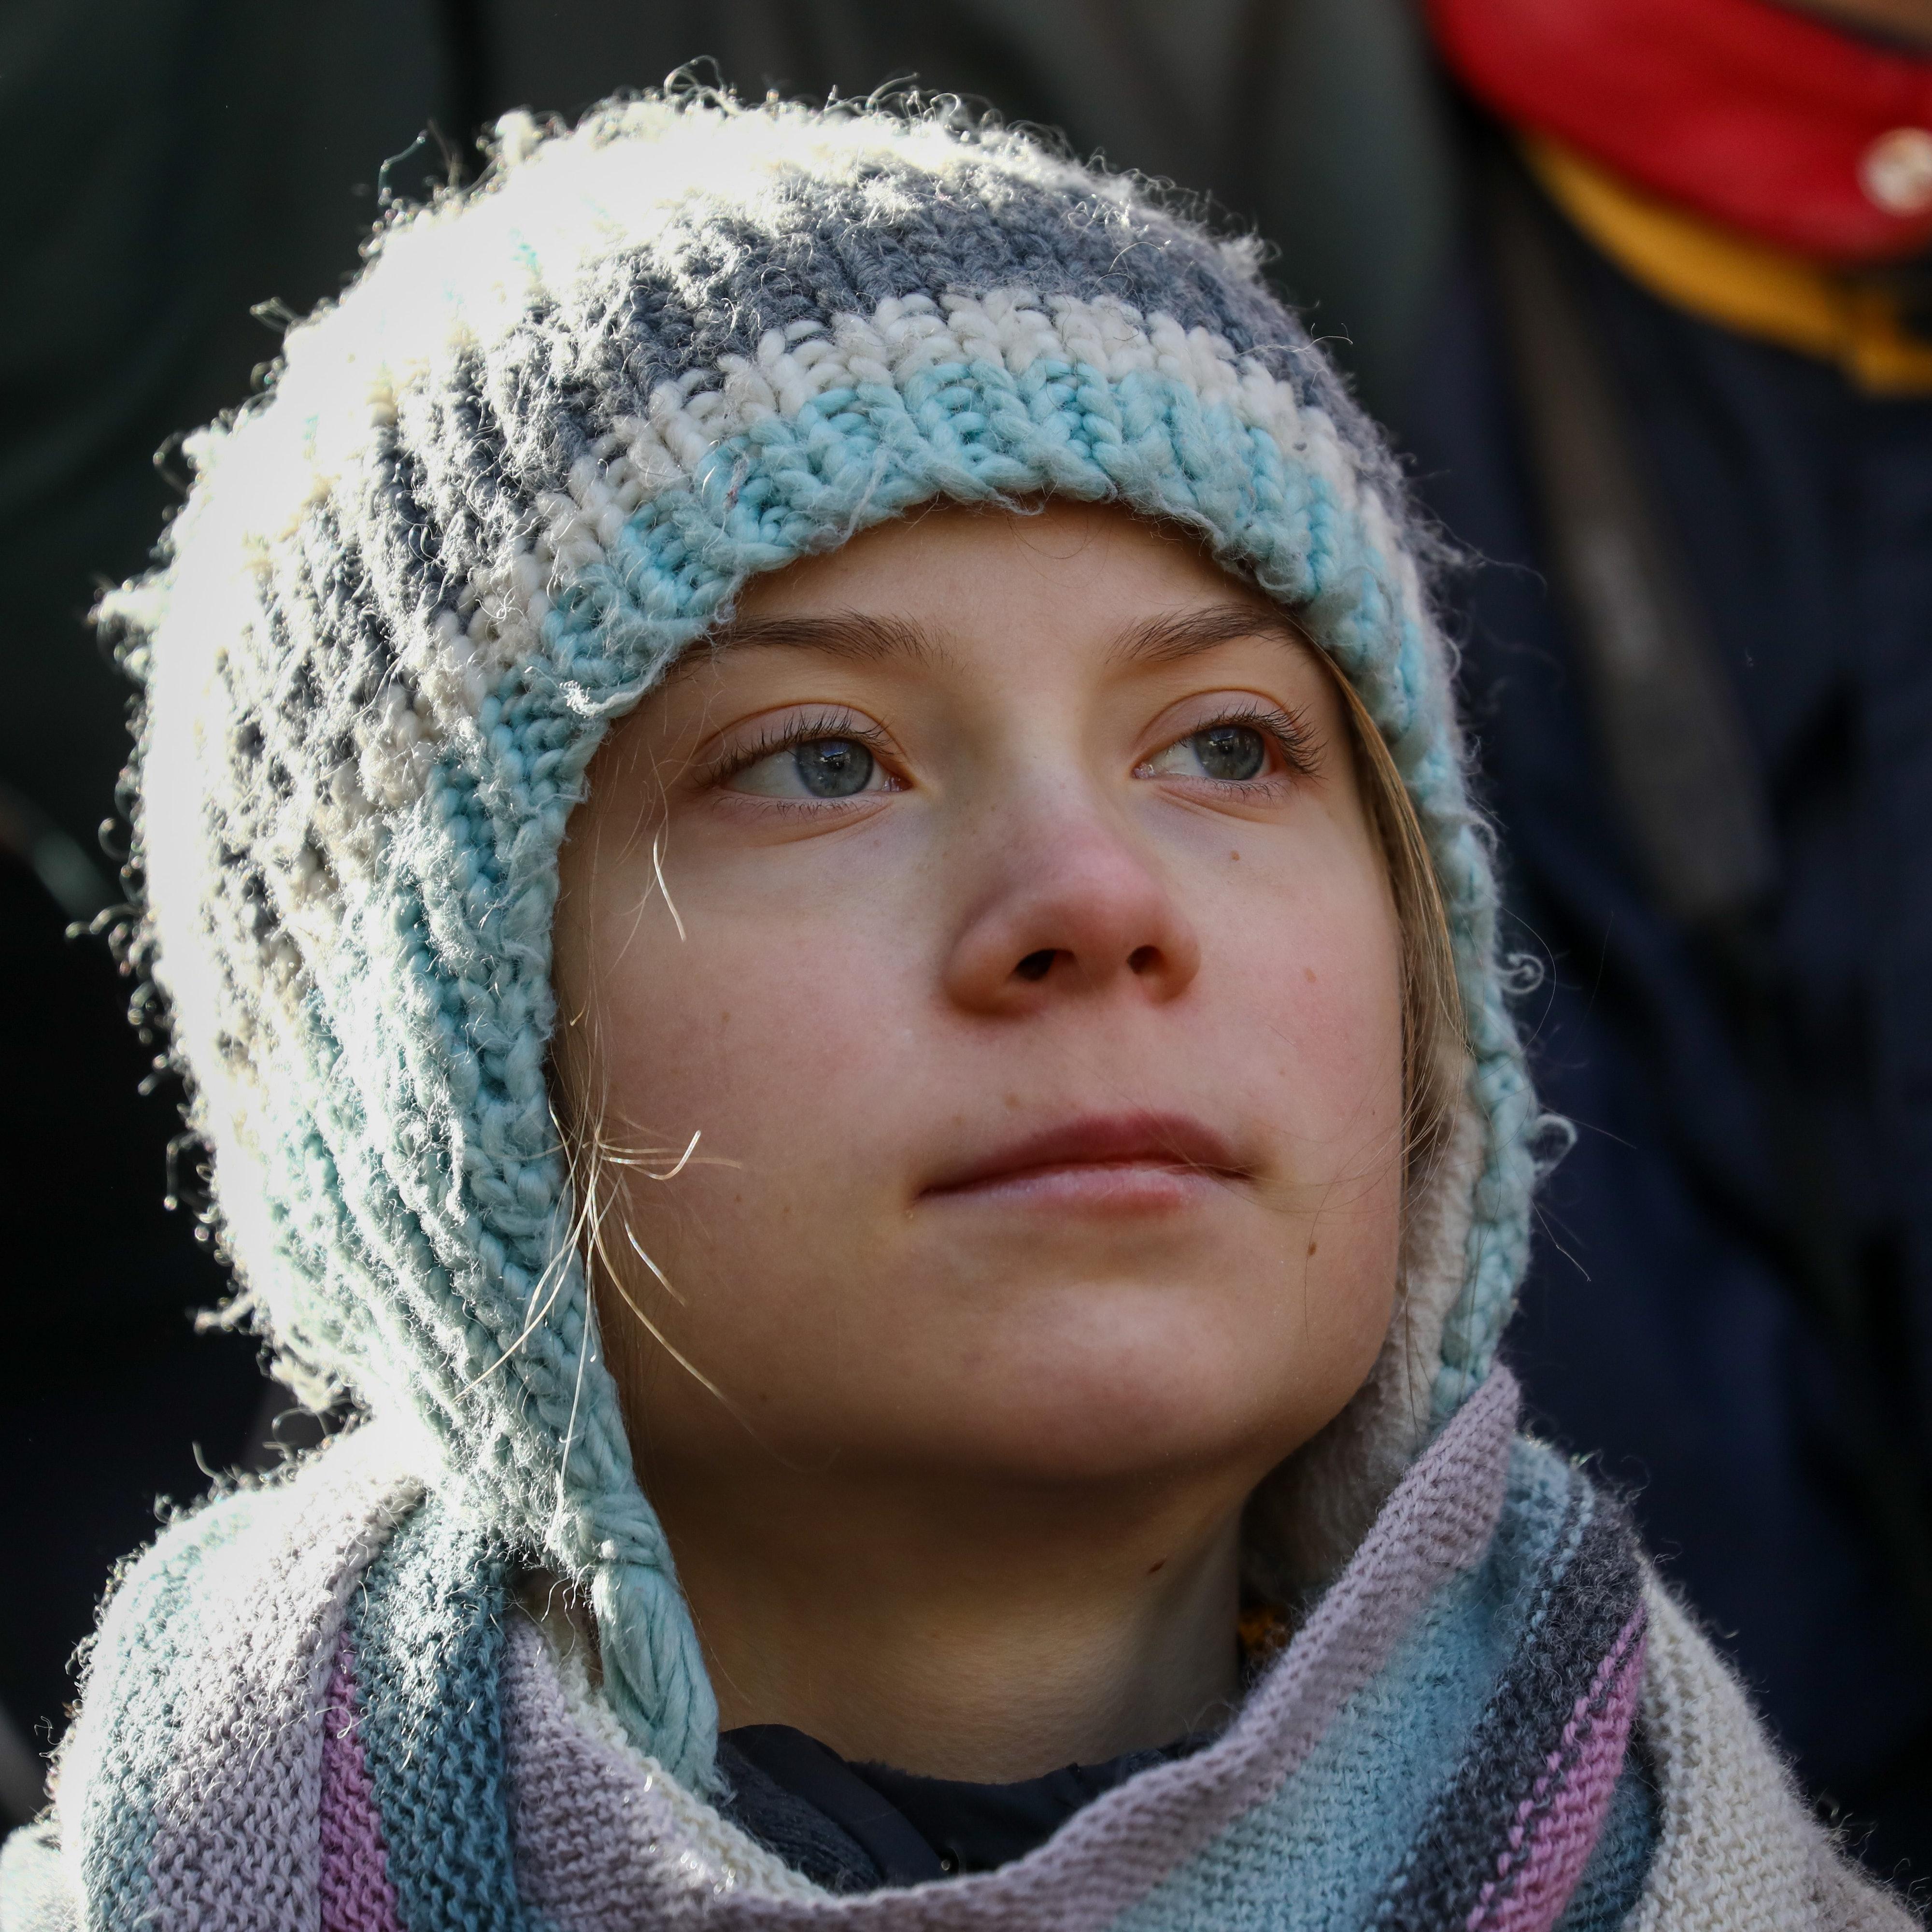 Greta Thunberg nominated for 2020 Nobel Peace Prize